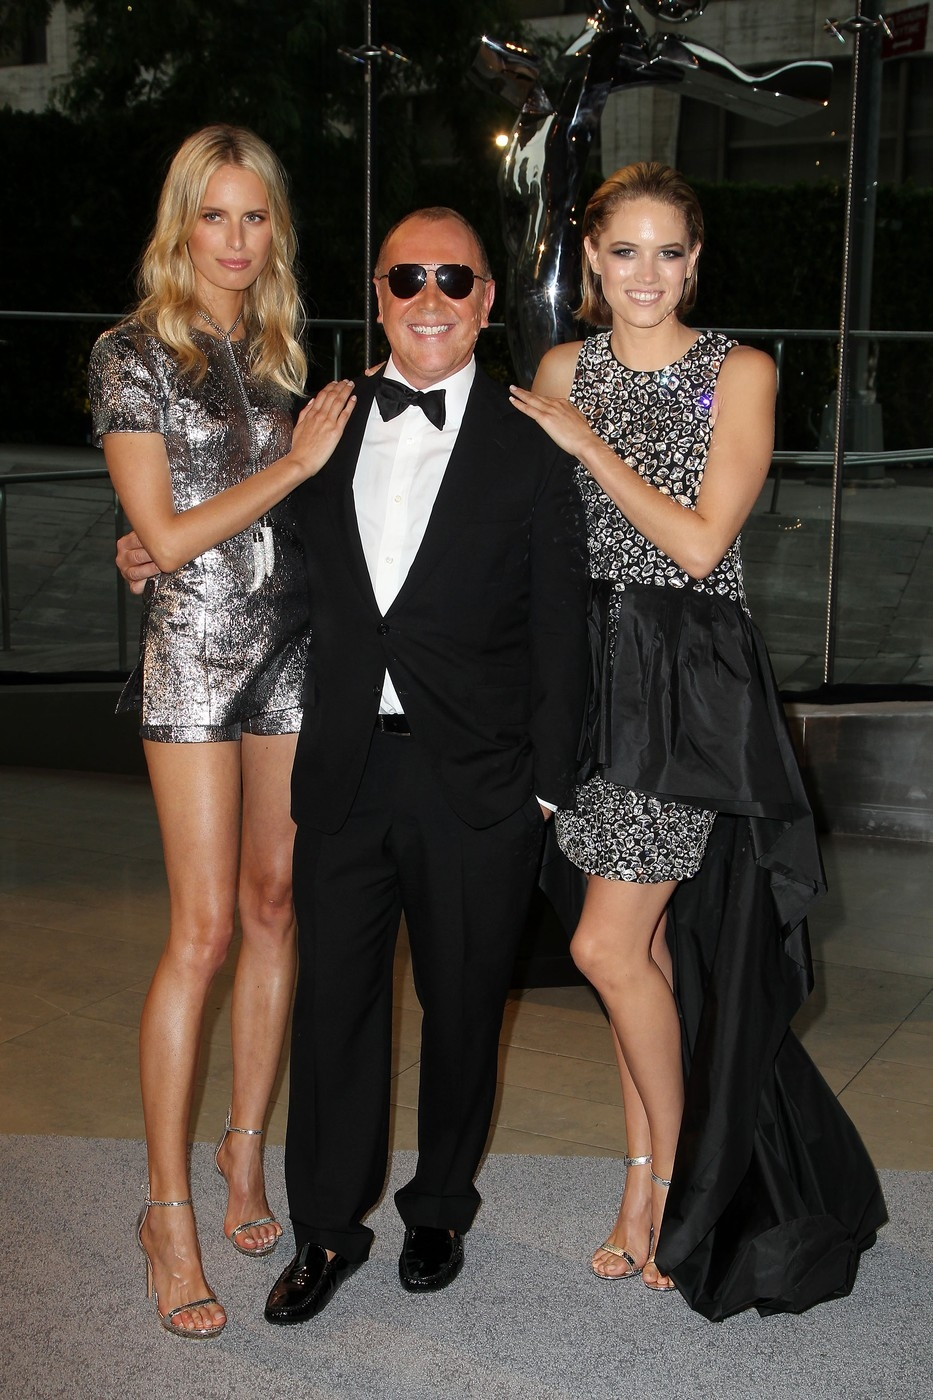 The 2013 CFDA Fashion Awards